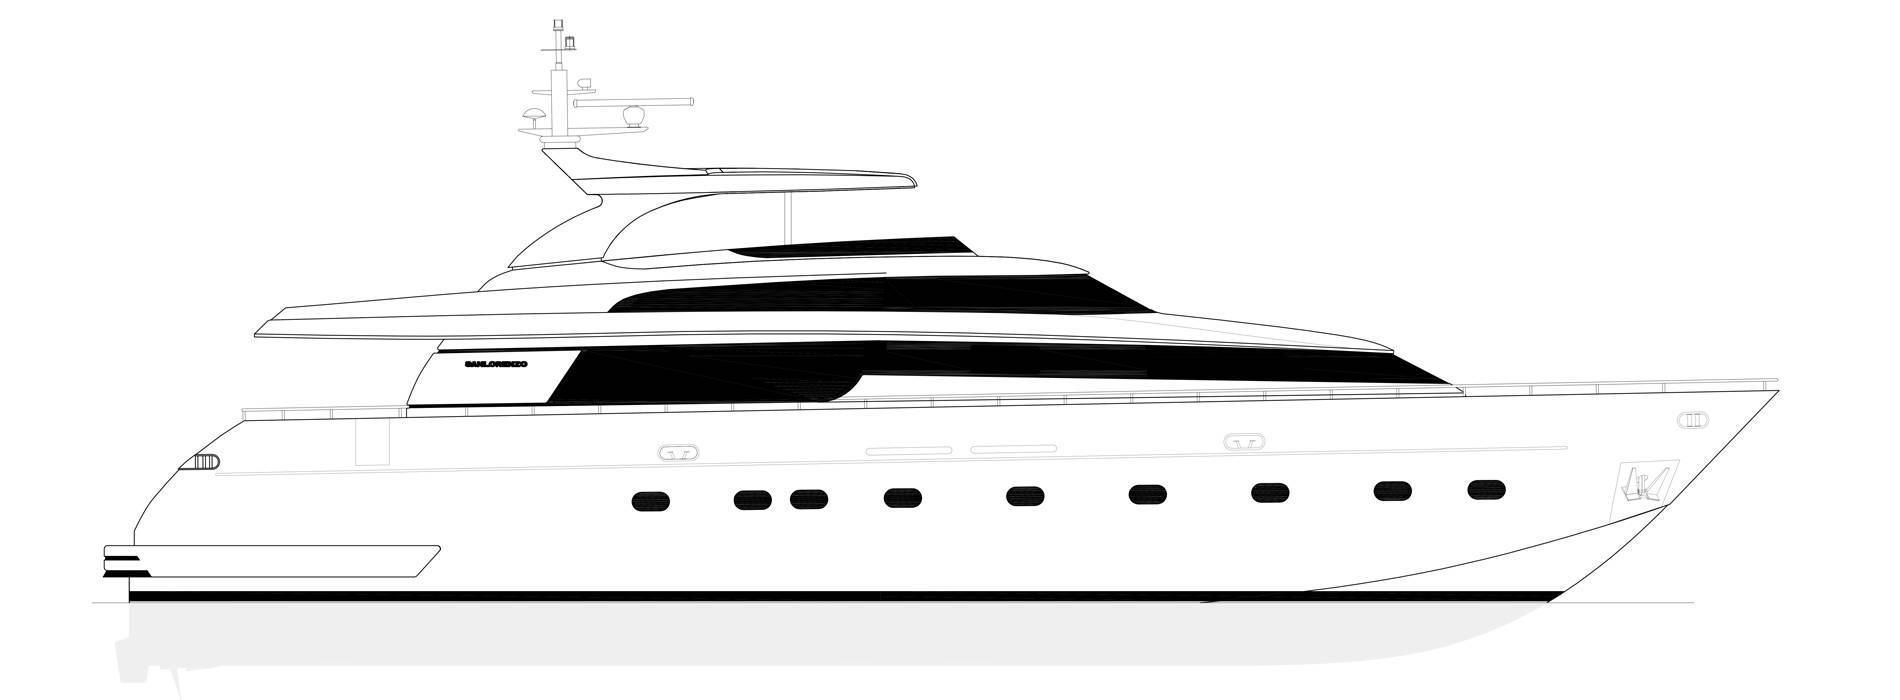 Sanlorenzo Yachts SL88-541 外观